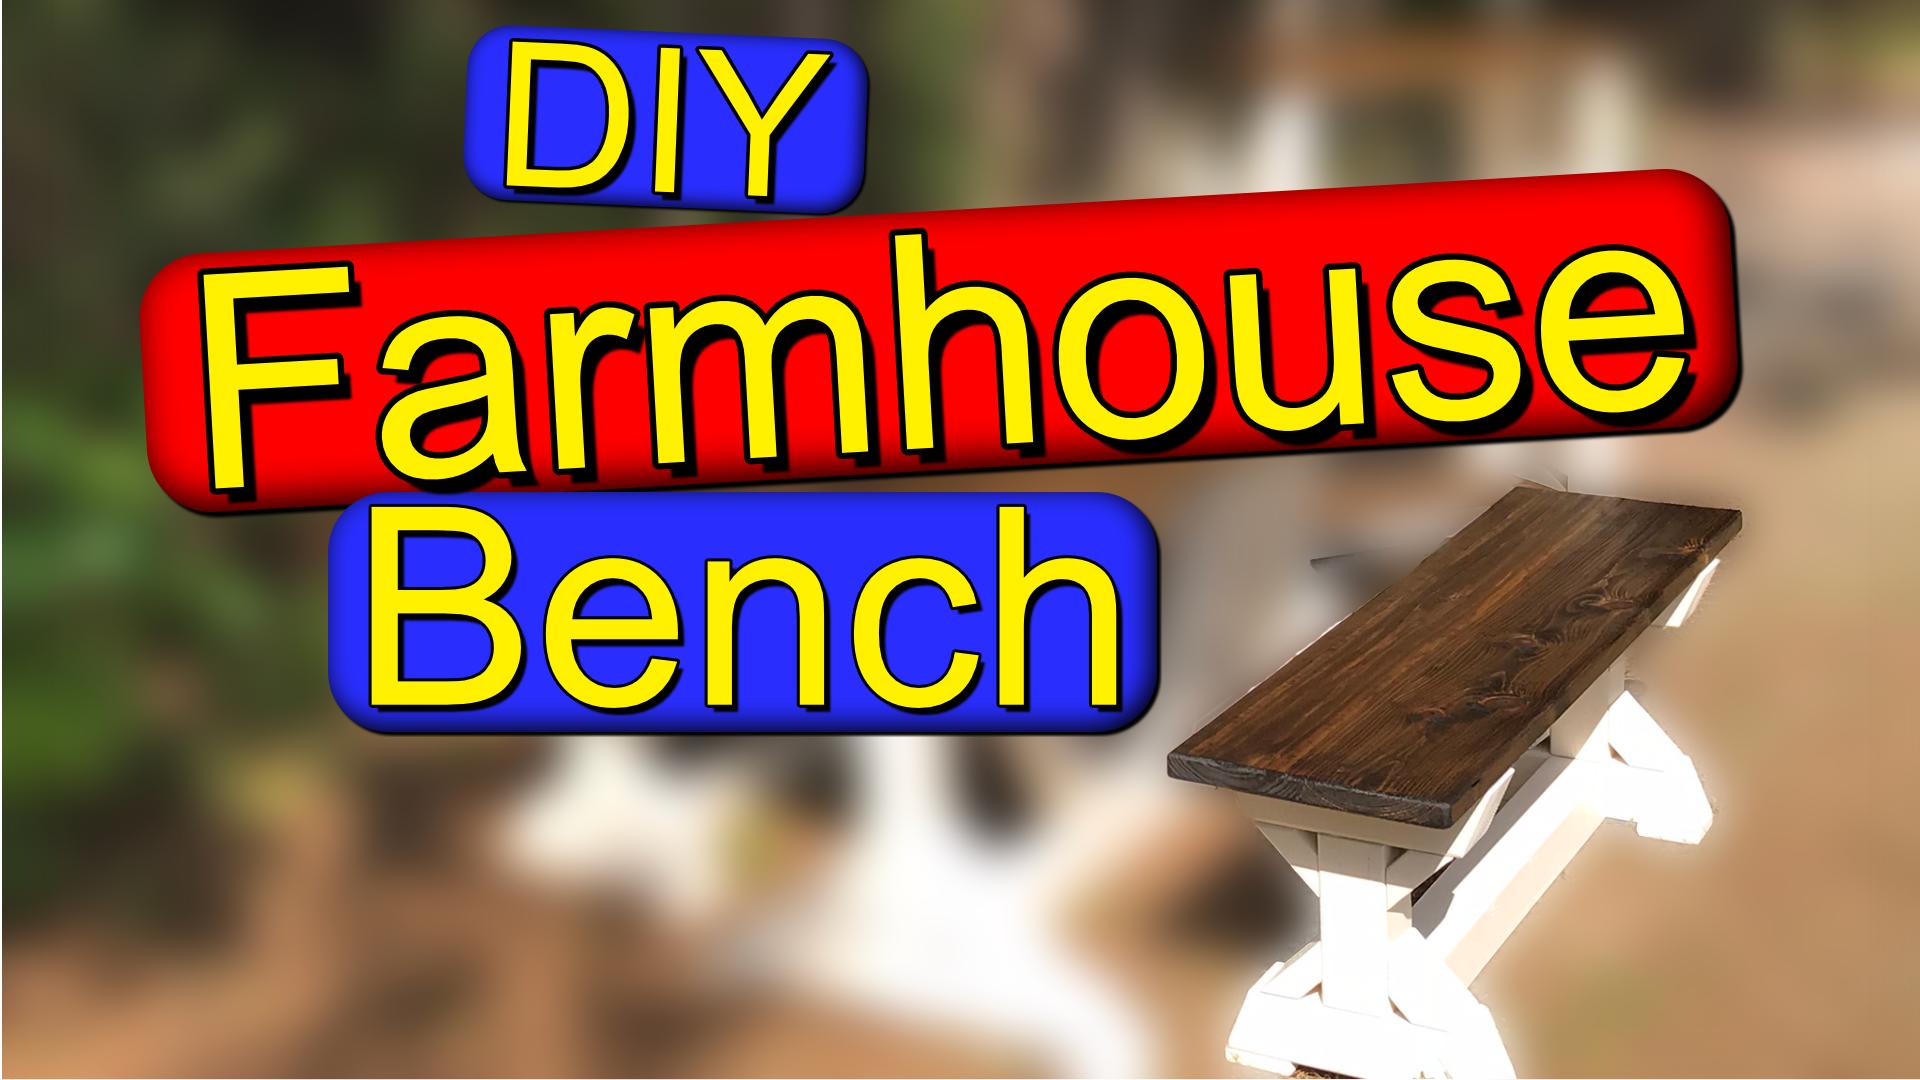 farmhouse bench yt thumb.png